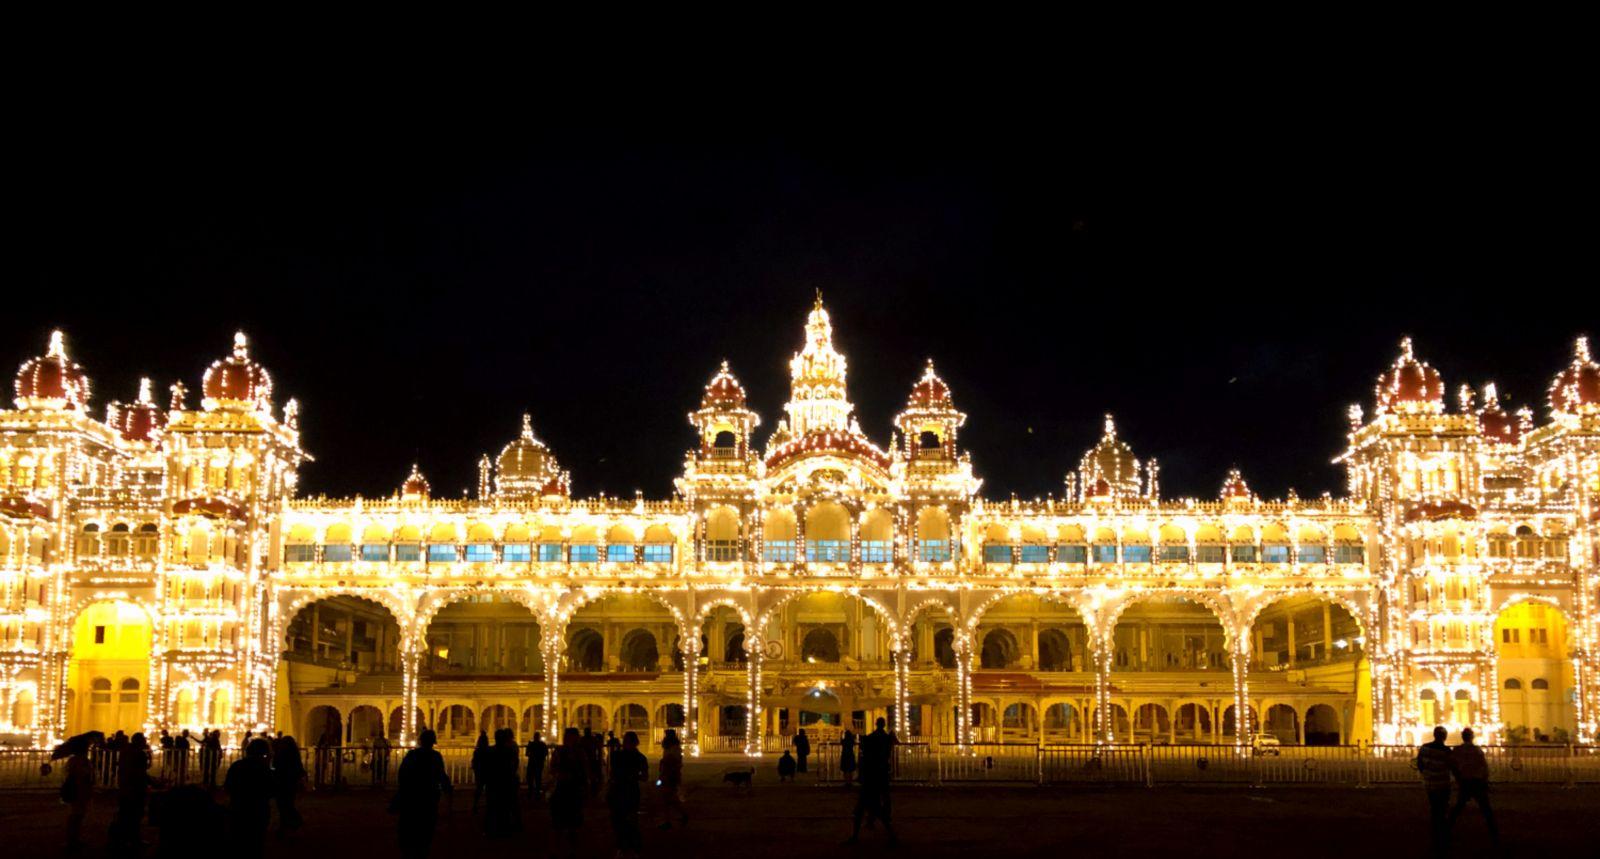 mysore-palace-at-night-cropped